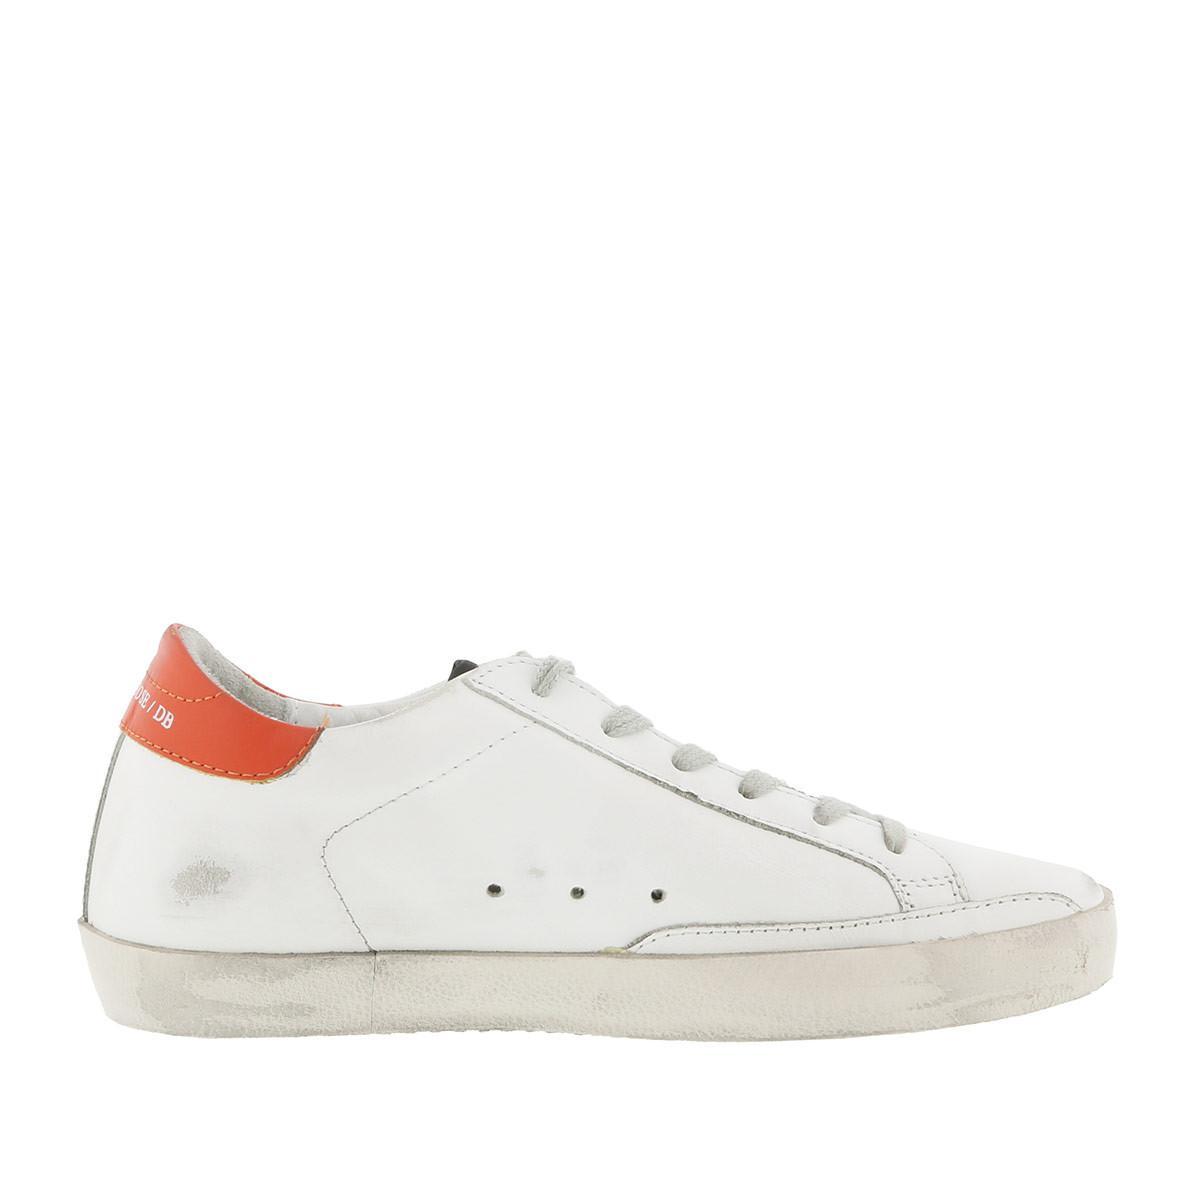 Golden Goose Deluxe Brand Leather Superstar Sneakers Orange Ice in White